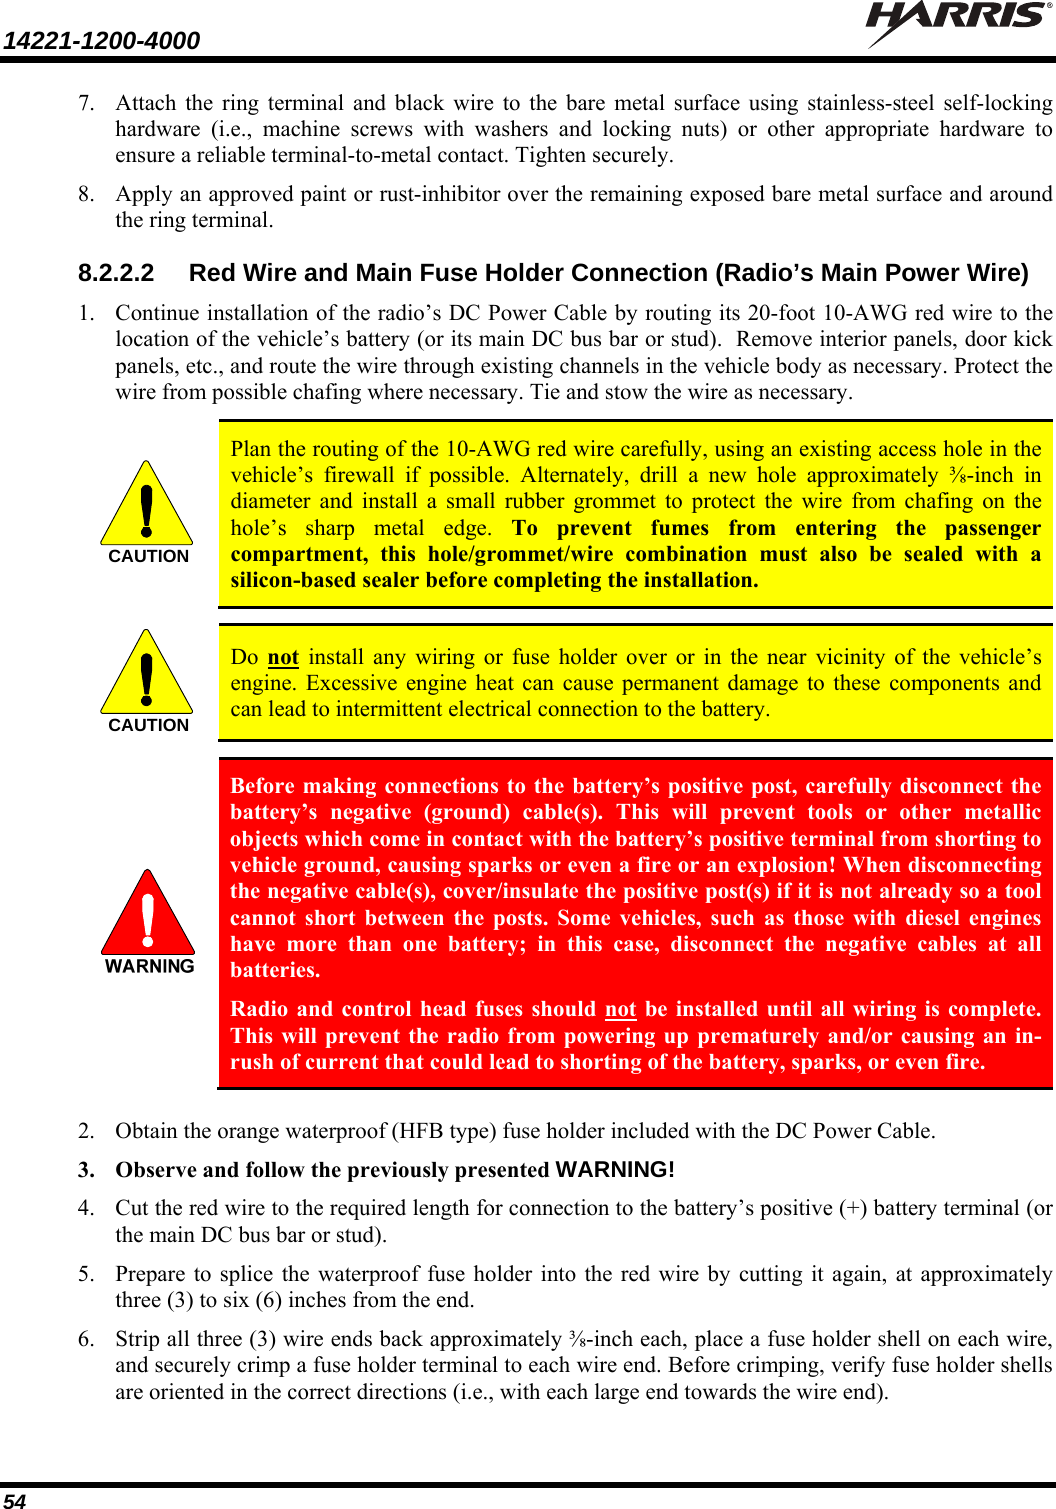 unity manual pdf